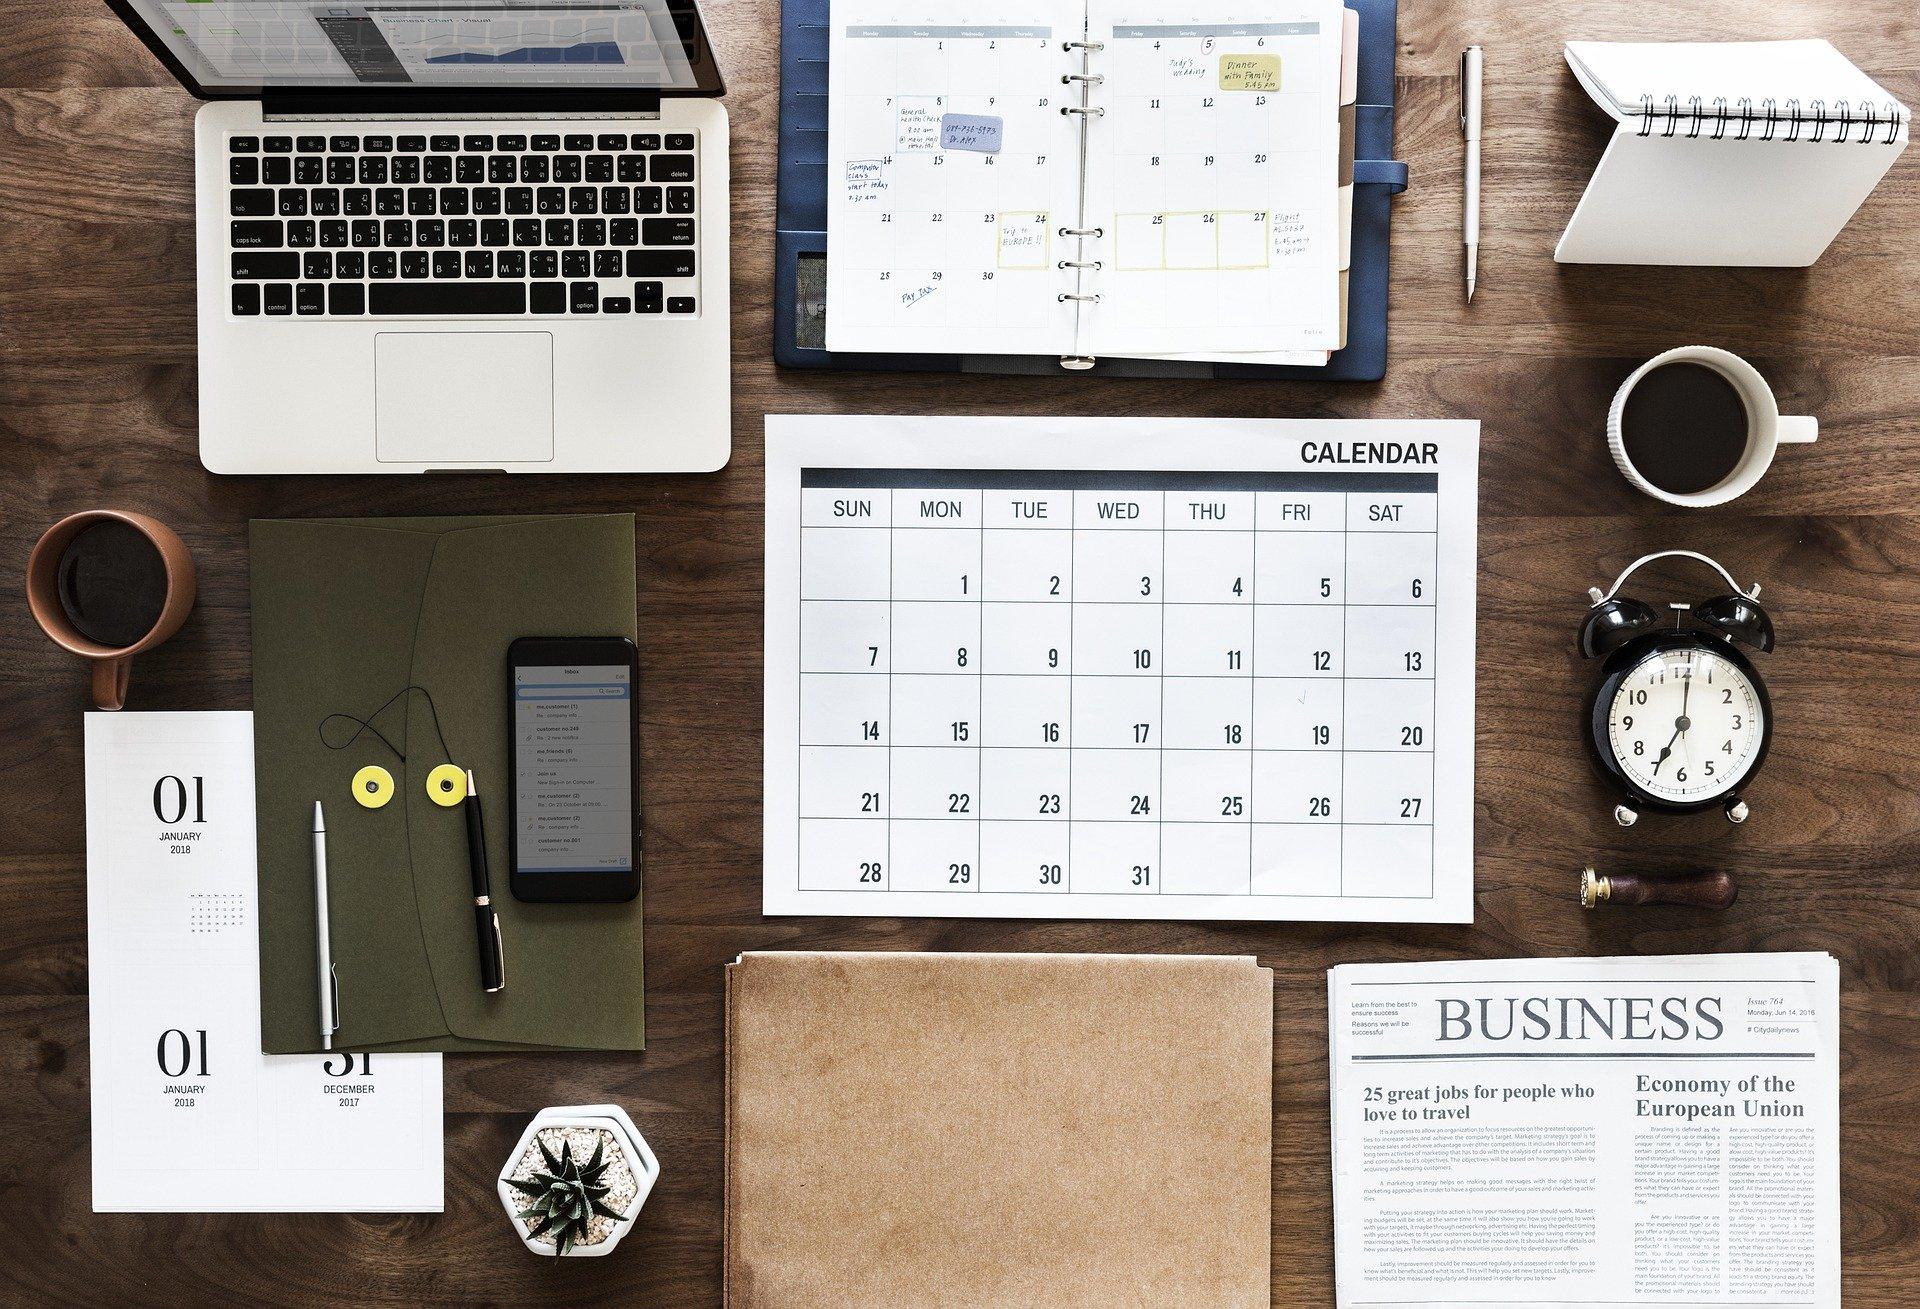 6 Simple Ways To Stay Organized